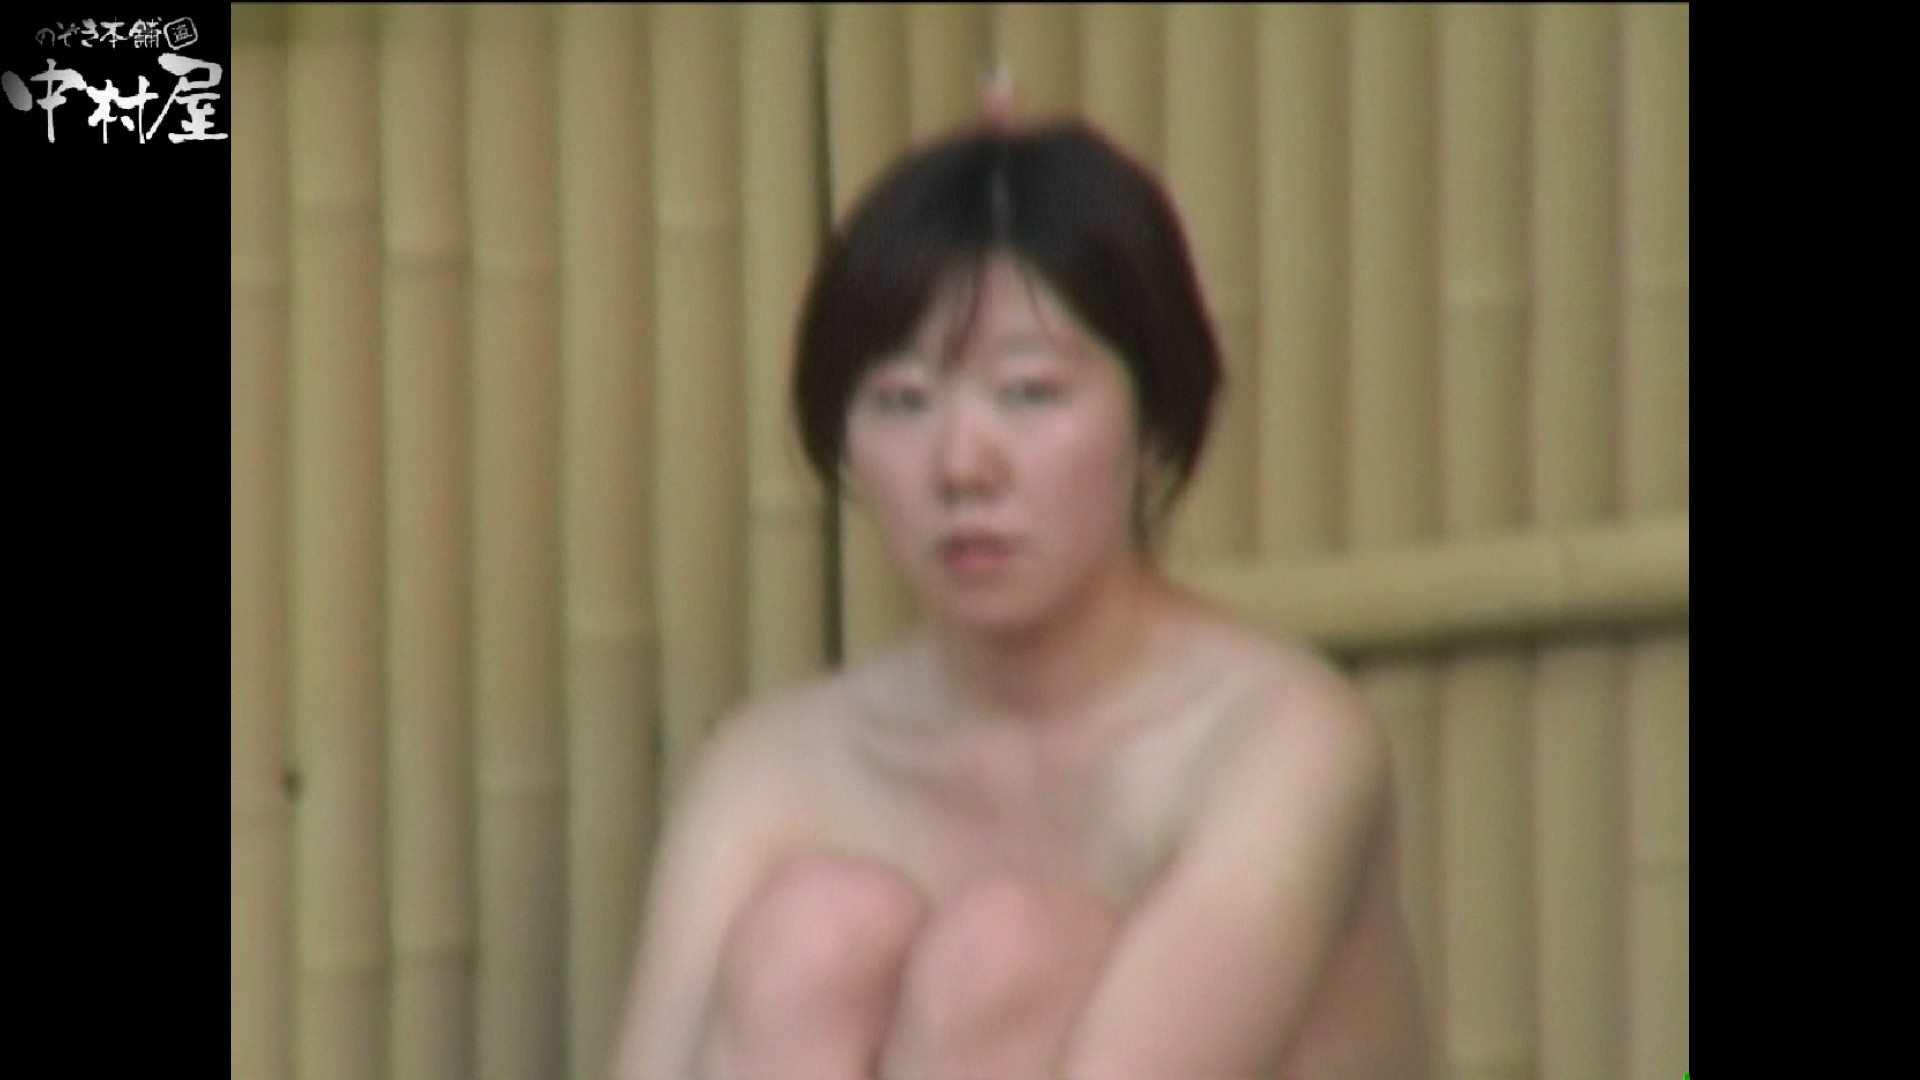 Aquaな露天風呂Vol.977 盗撮師作品  83pic 57